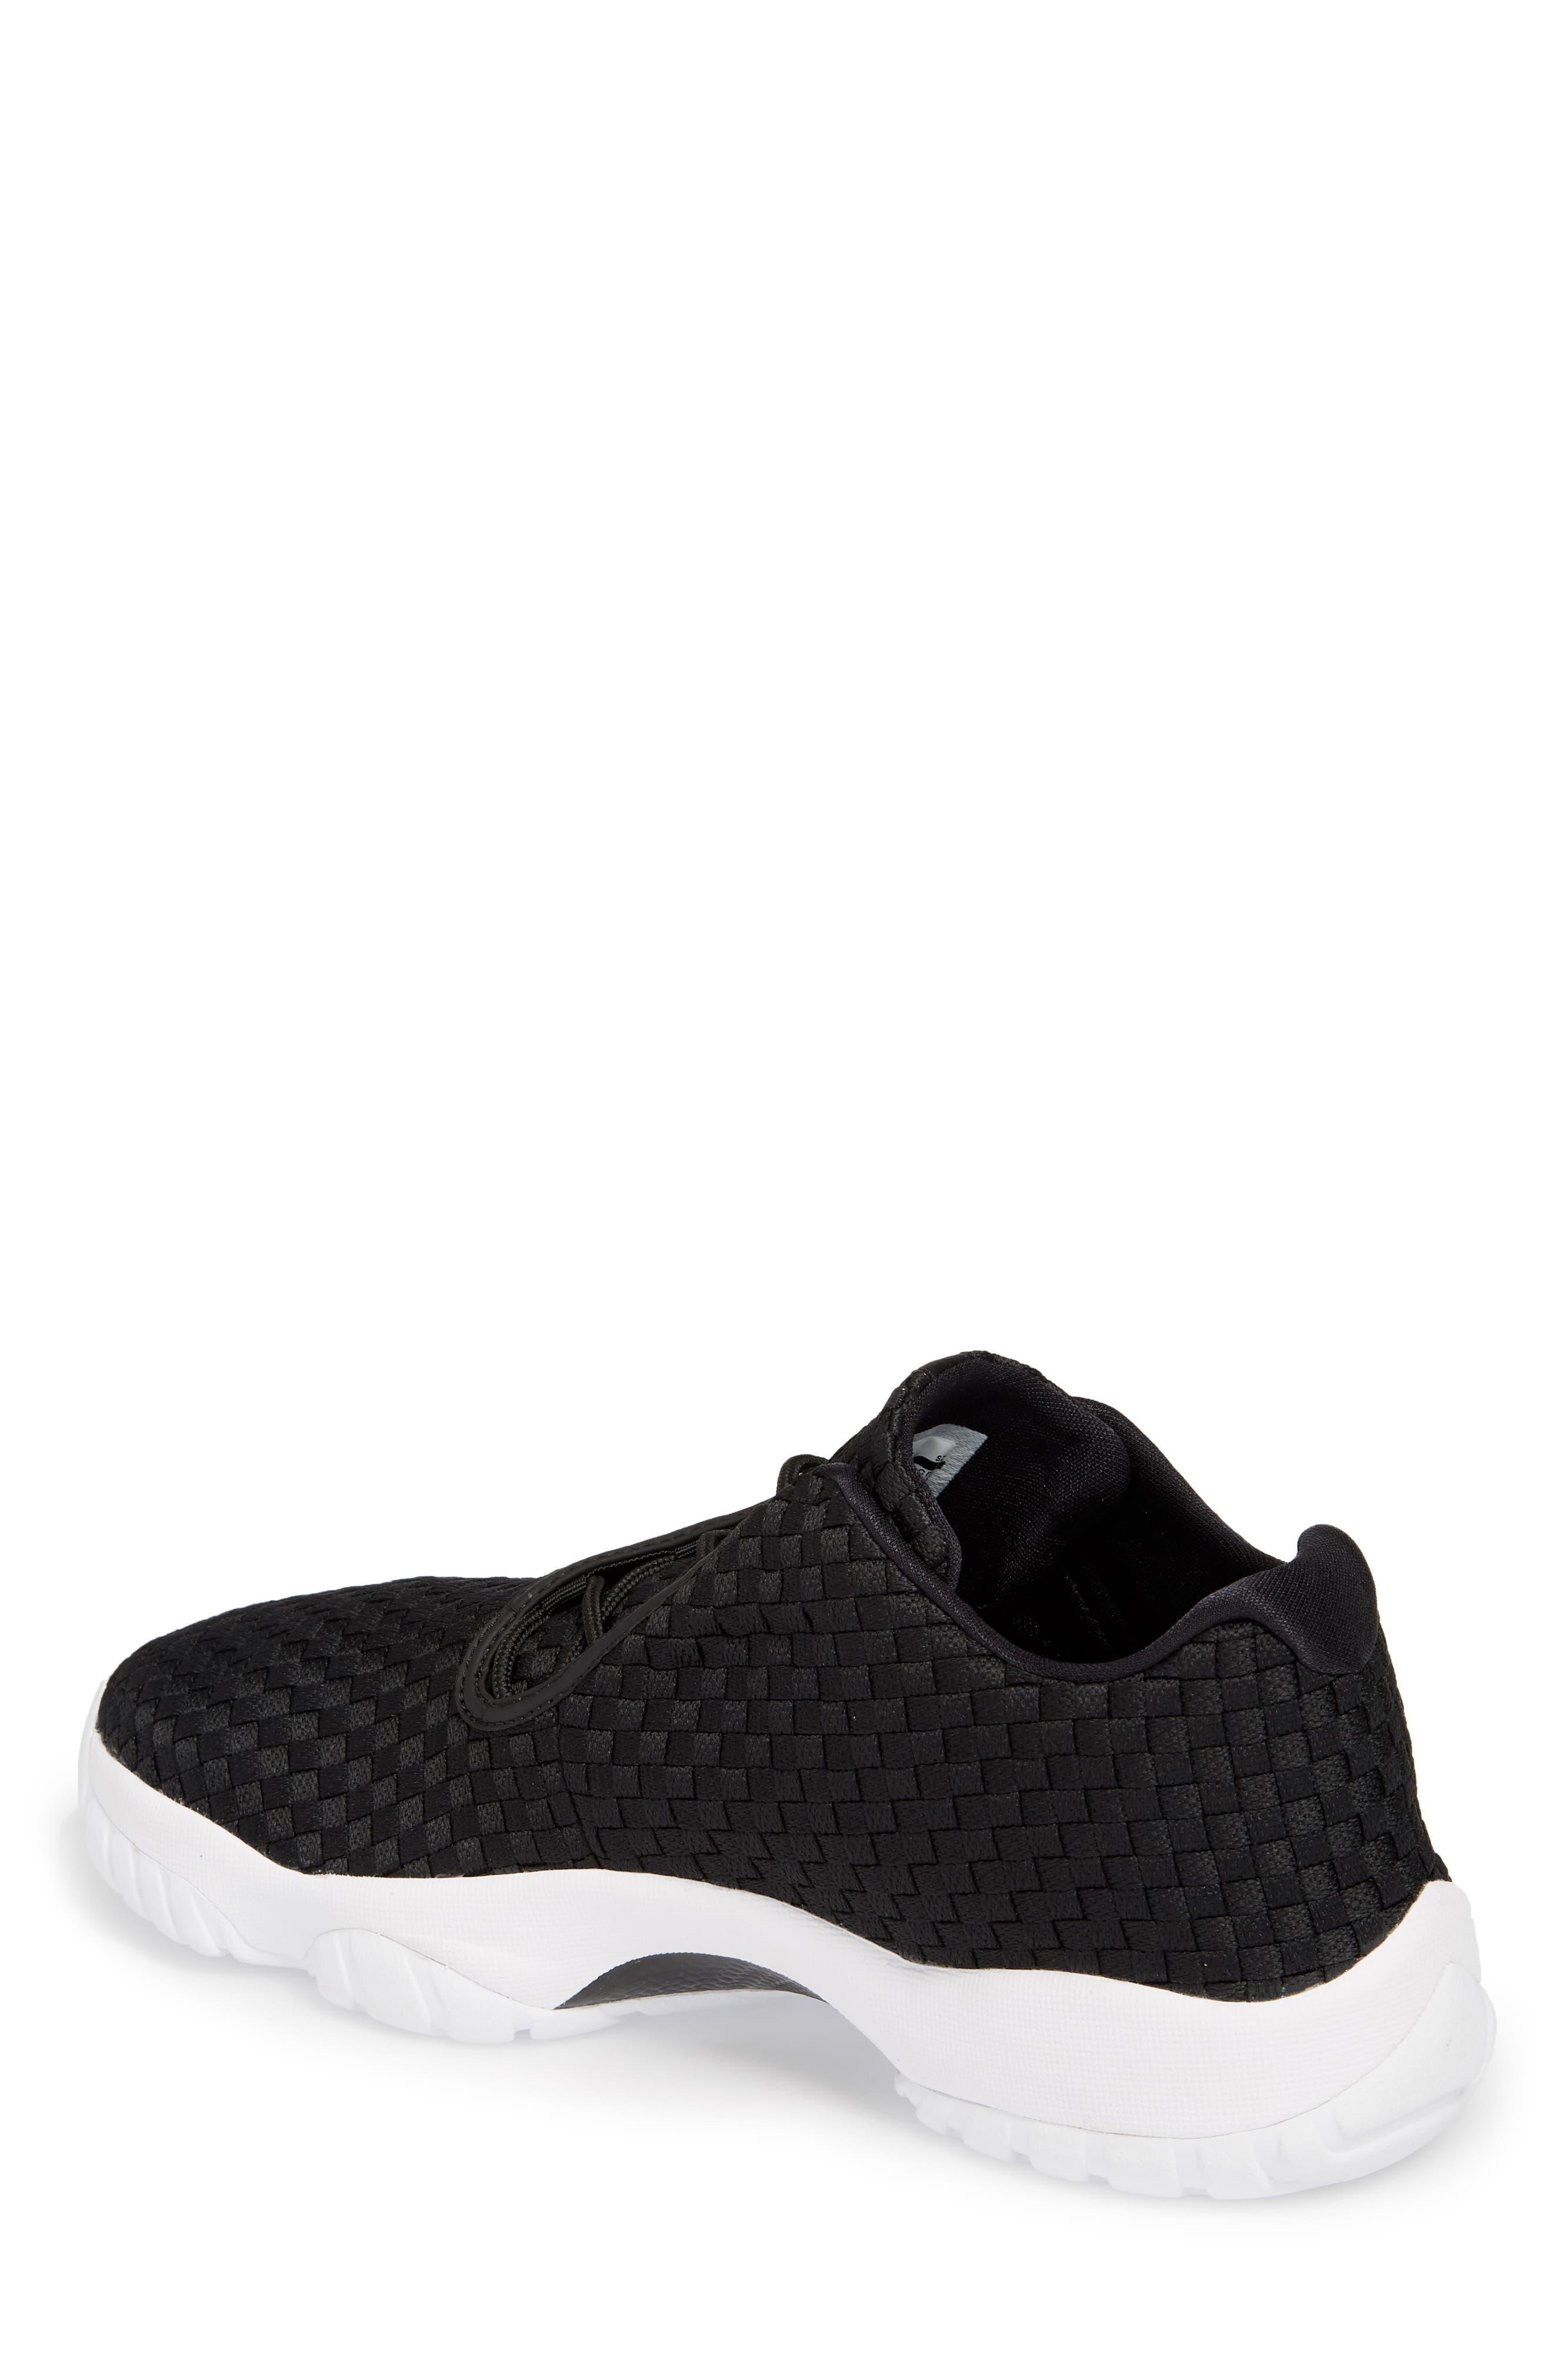 Air Jordan Future Woven Sneaker,                             Alternate thumbnail 2, color,                             002